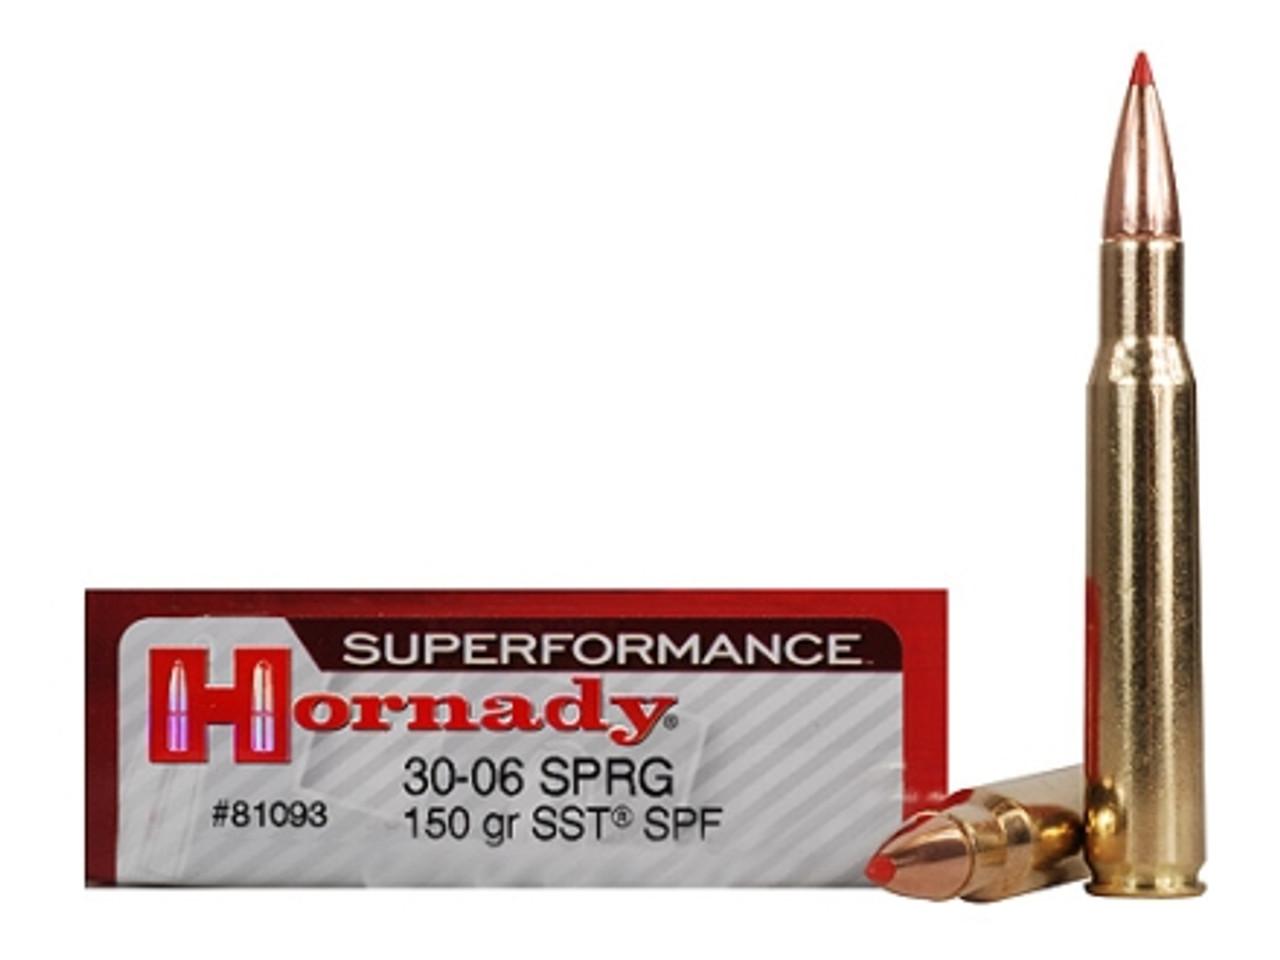 30-06 Sprg 150 Grain SST Hornady SUPERFORMANCE - 20 Rounds